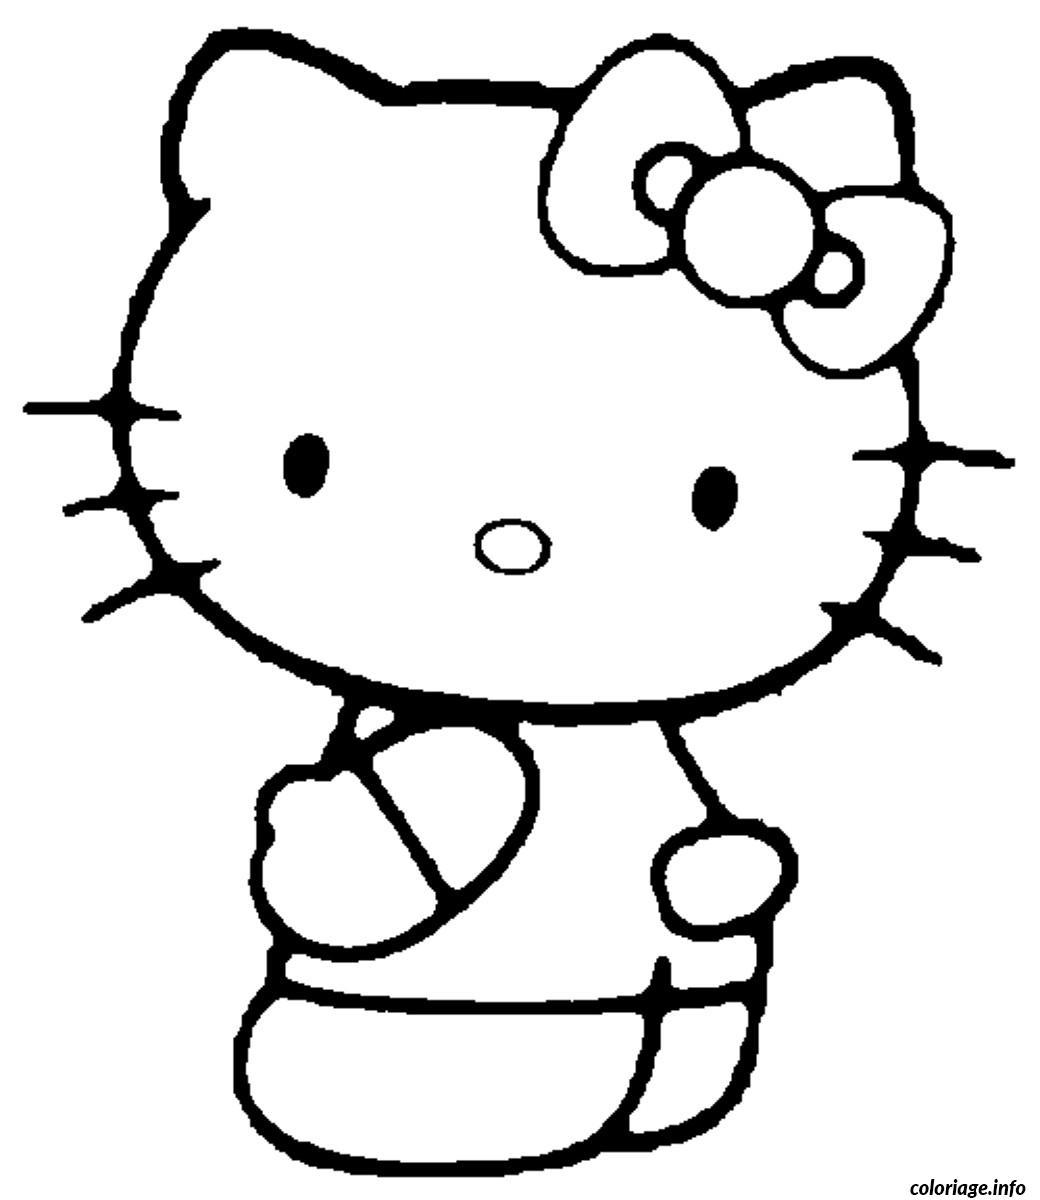 Coloriage dessin hello kitty 88 - Coloriage hello kitty coeur ...